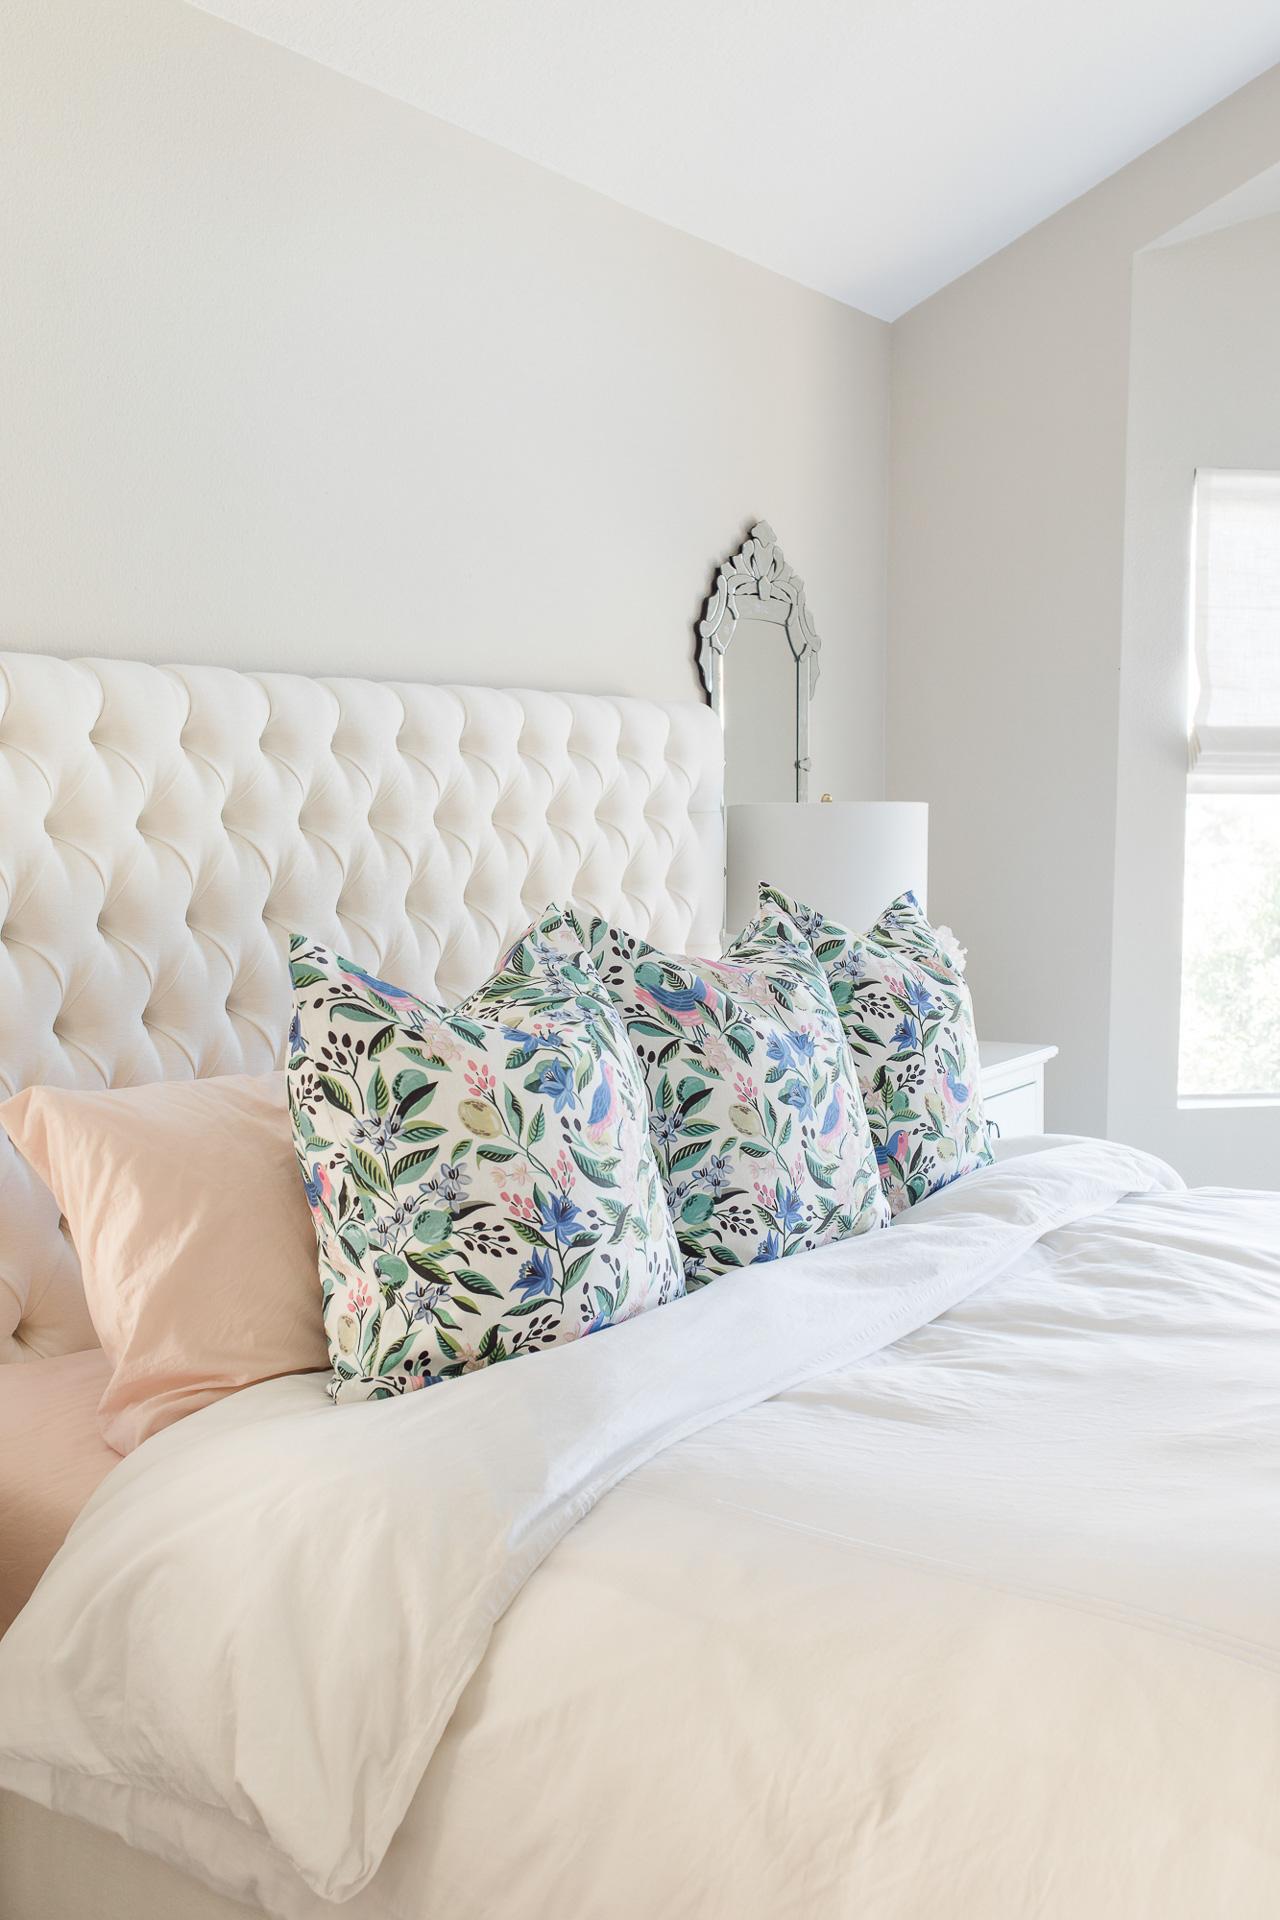 I love neutral bedroom decor! - M Loves M @marmar